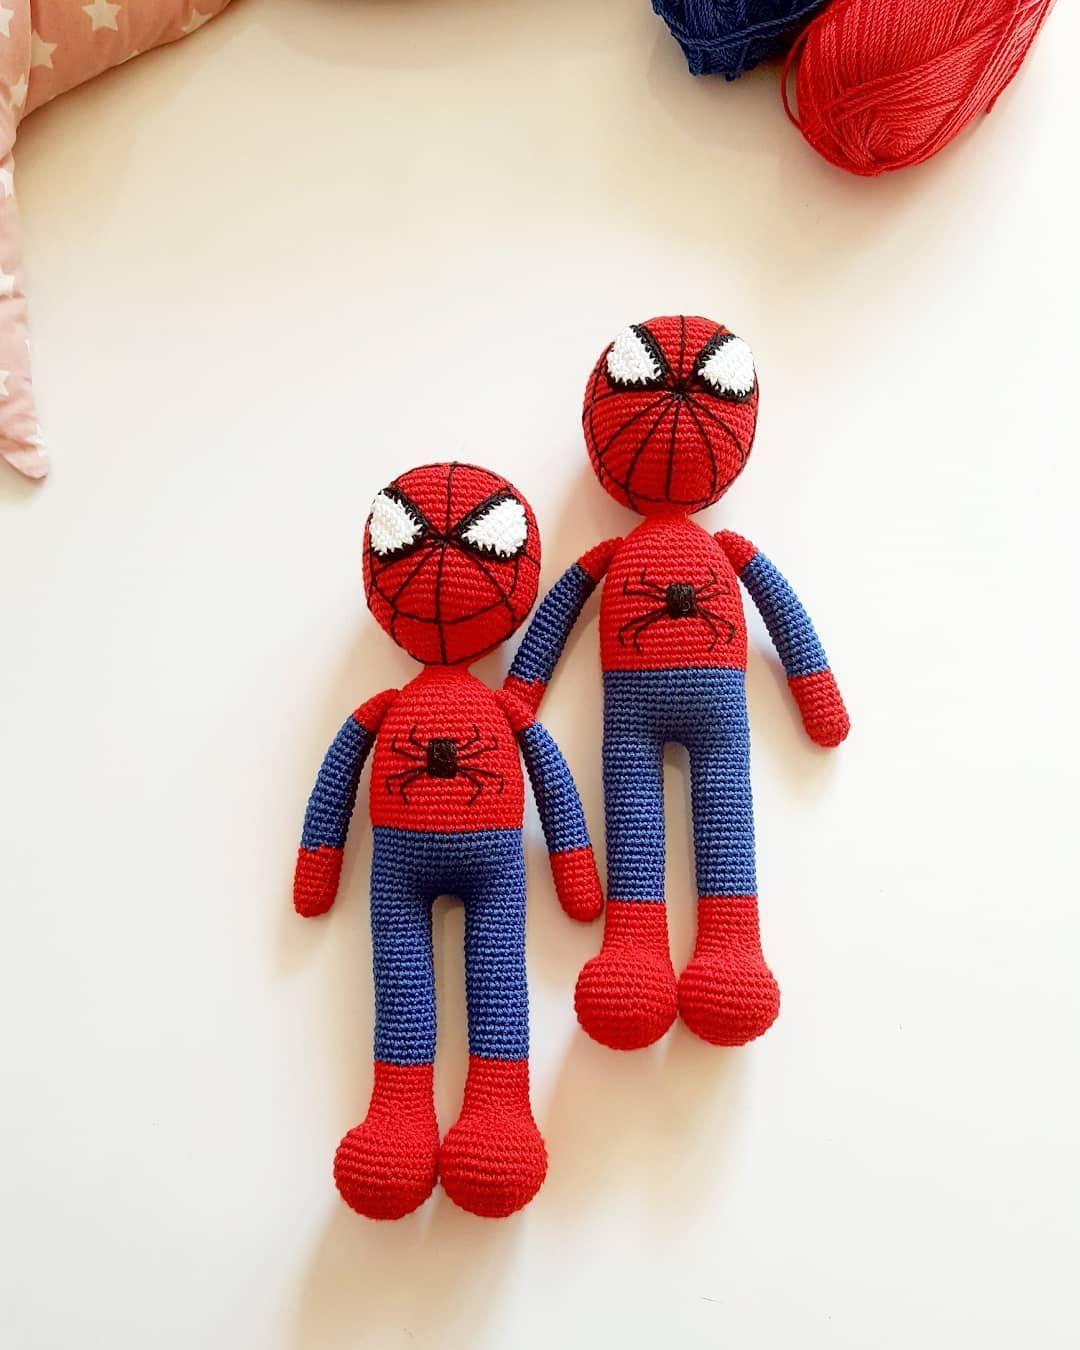 Spider-Man Amigurumi Doll Crochet Patterns Ideas Free | Crochet ... | 1350x1080